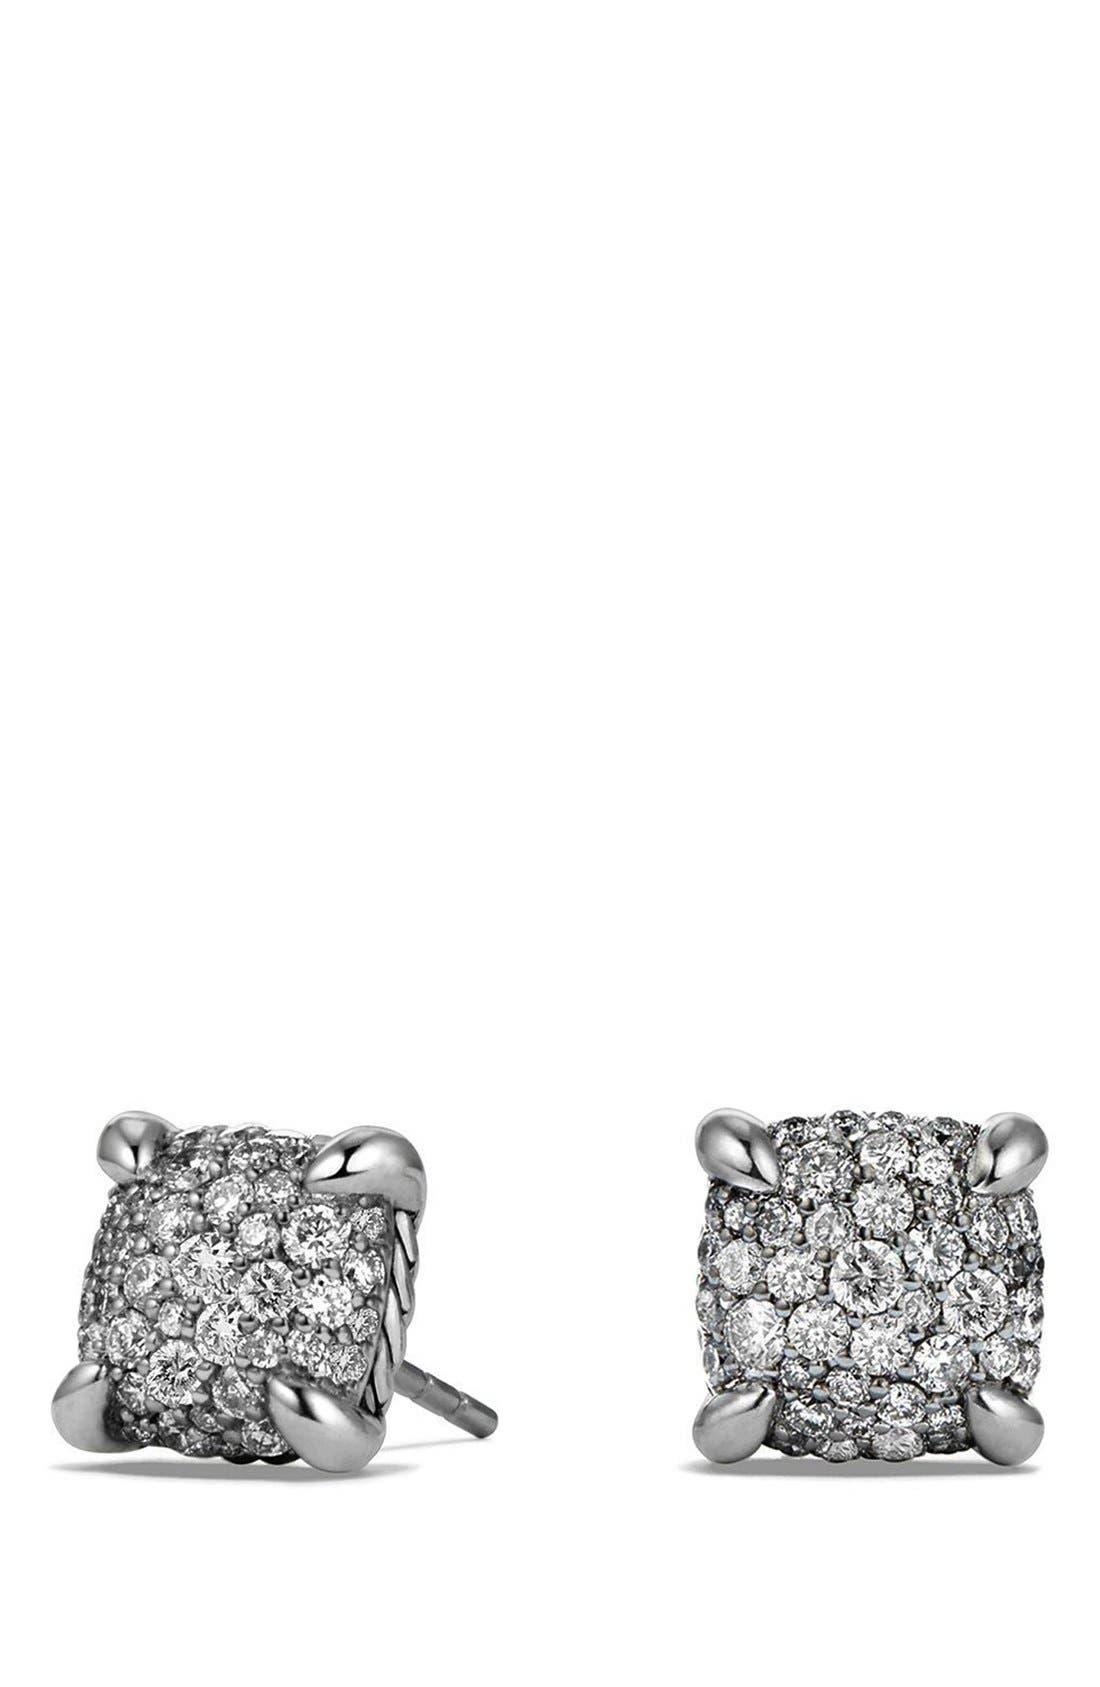 David Yurman 'Châtelaine' Earrings with Diamonds